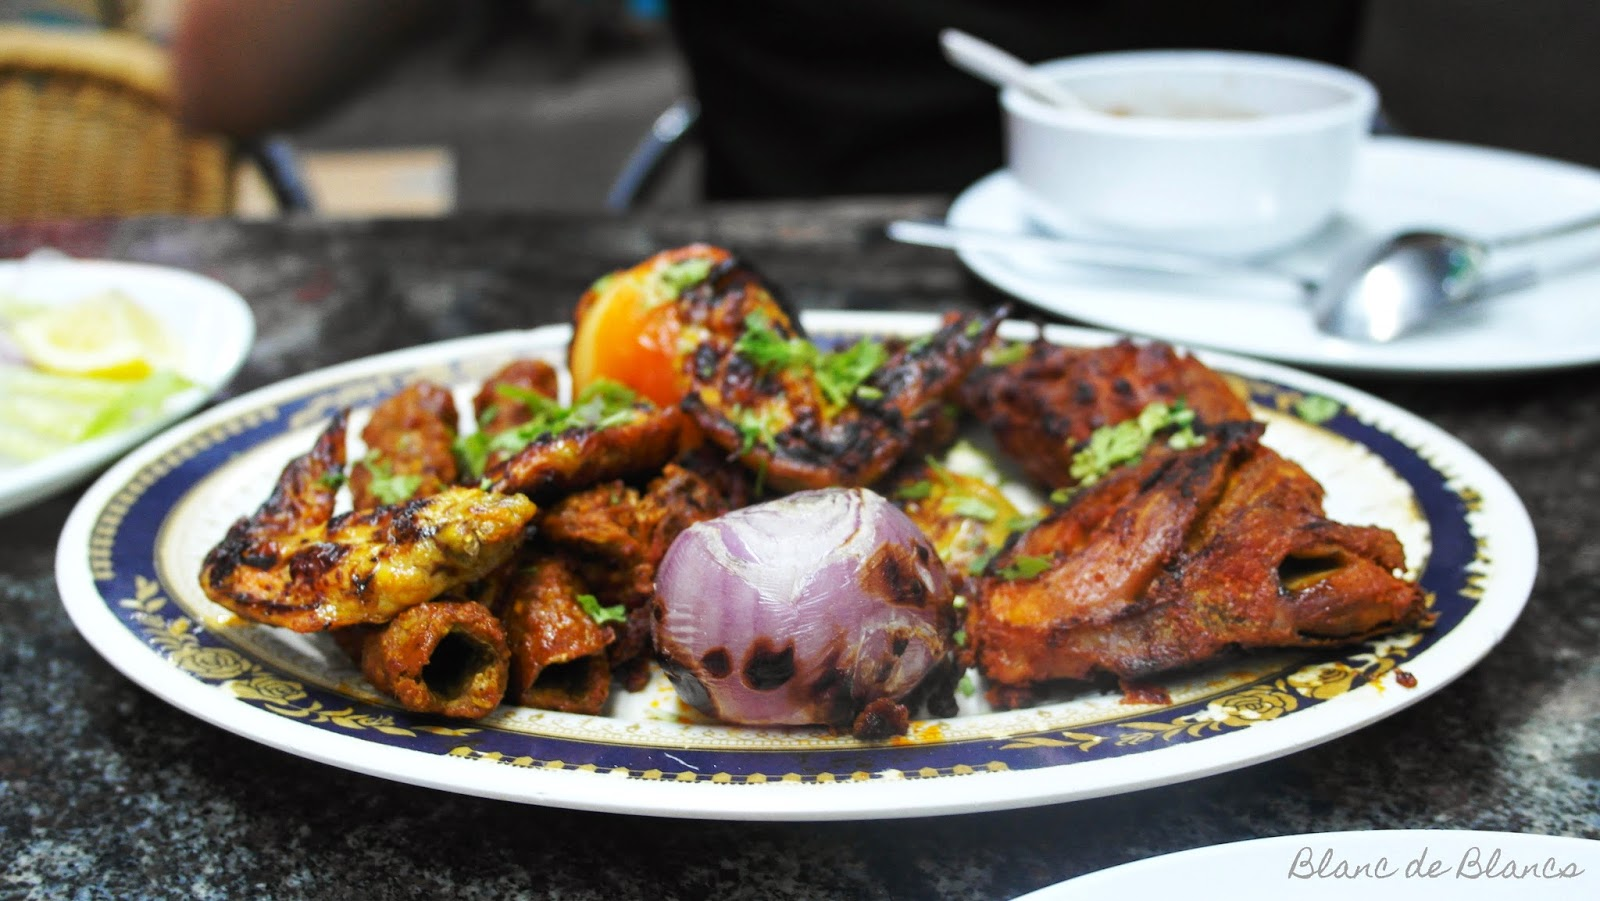 Ravi Pakistani Restaurant Dubai - www.blancdeblancs.fi